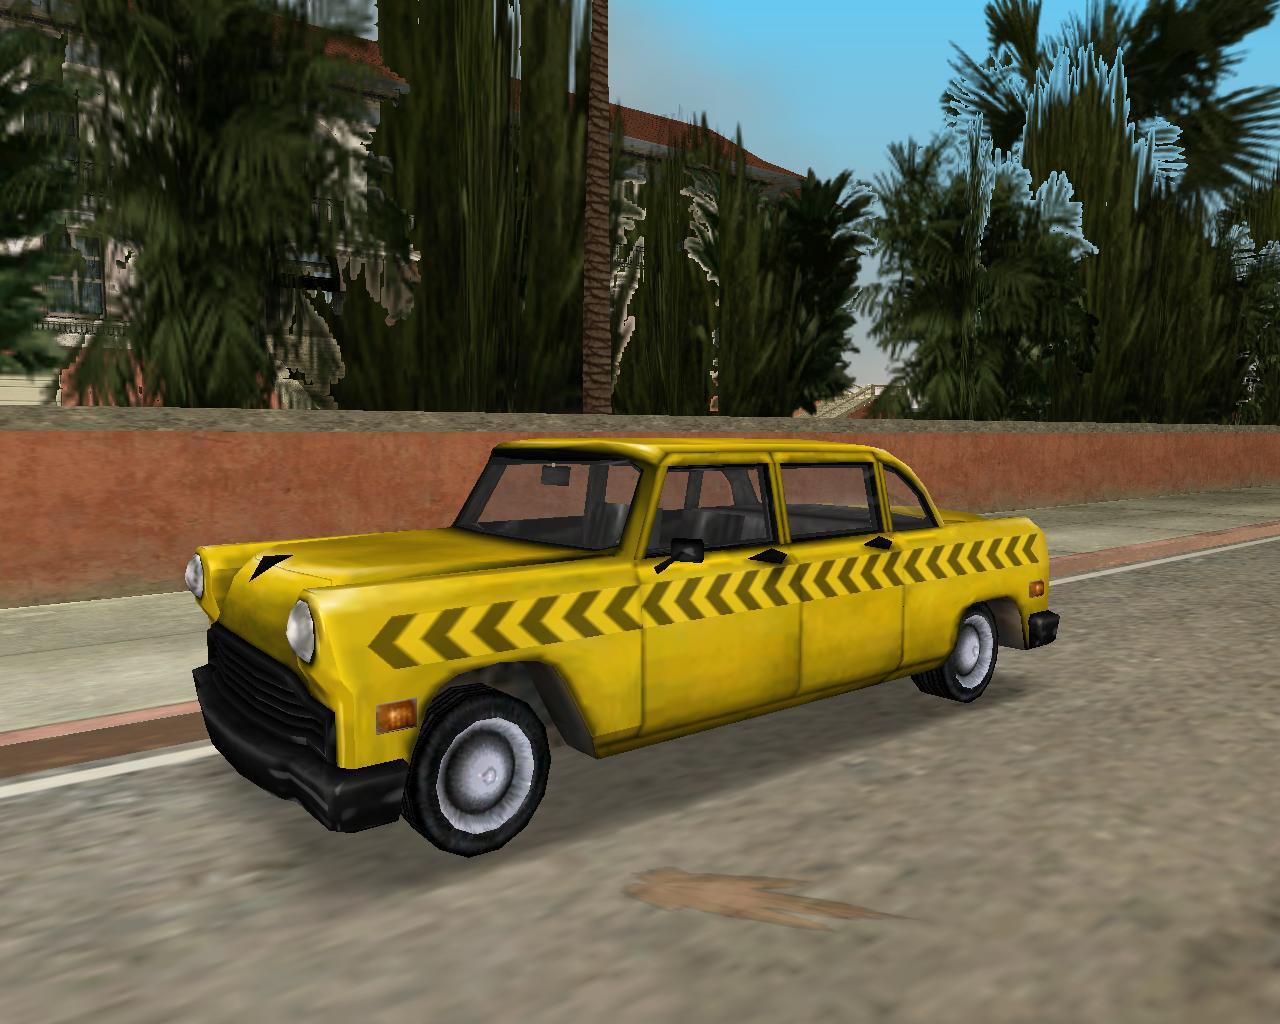 NE Cabbie - Grand Theft Auto: Vice City